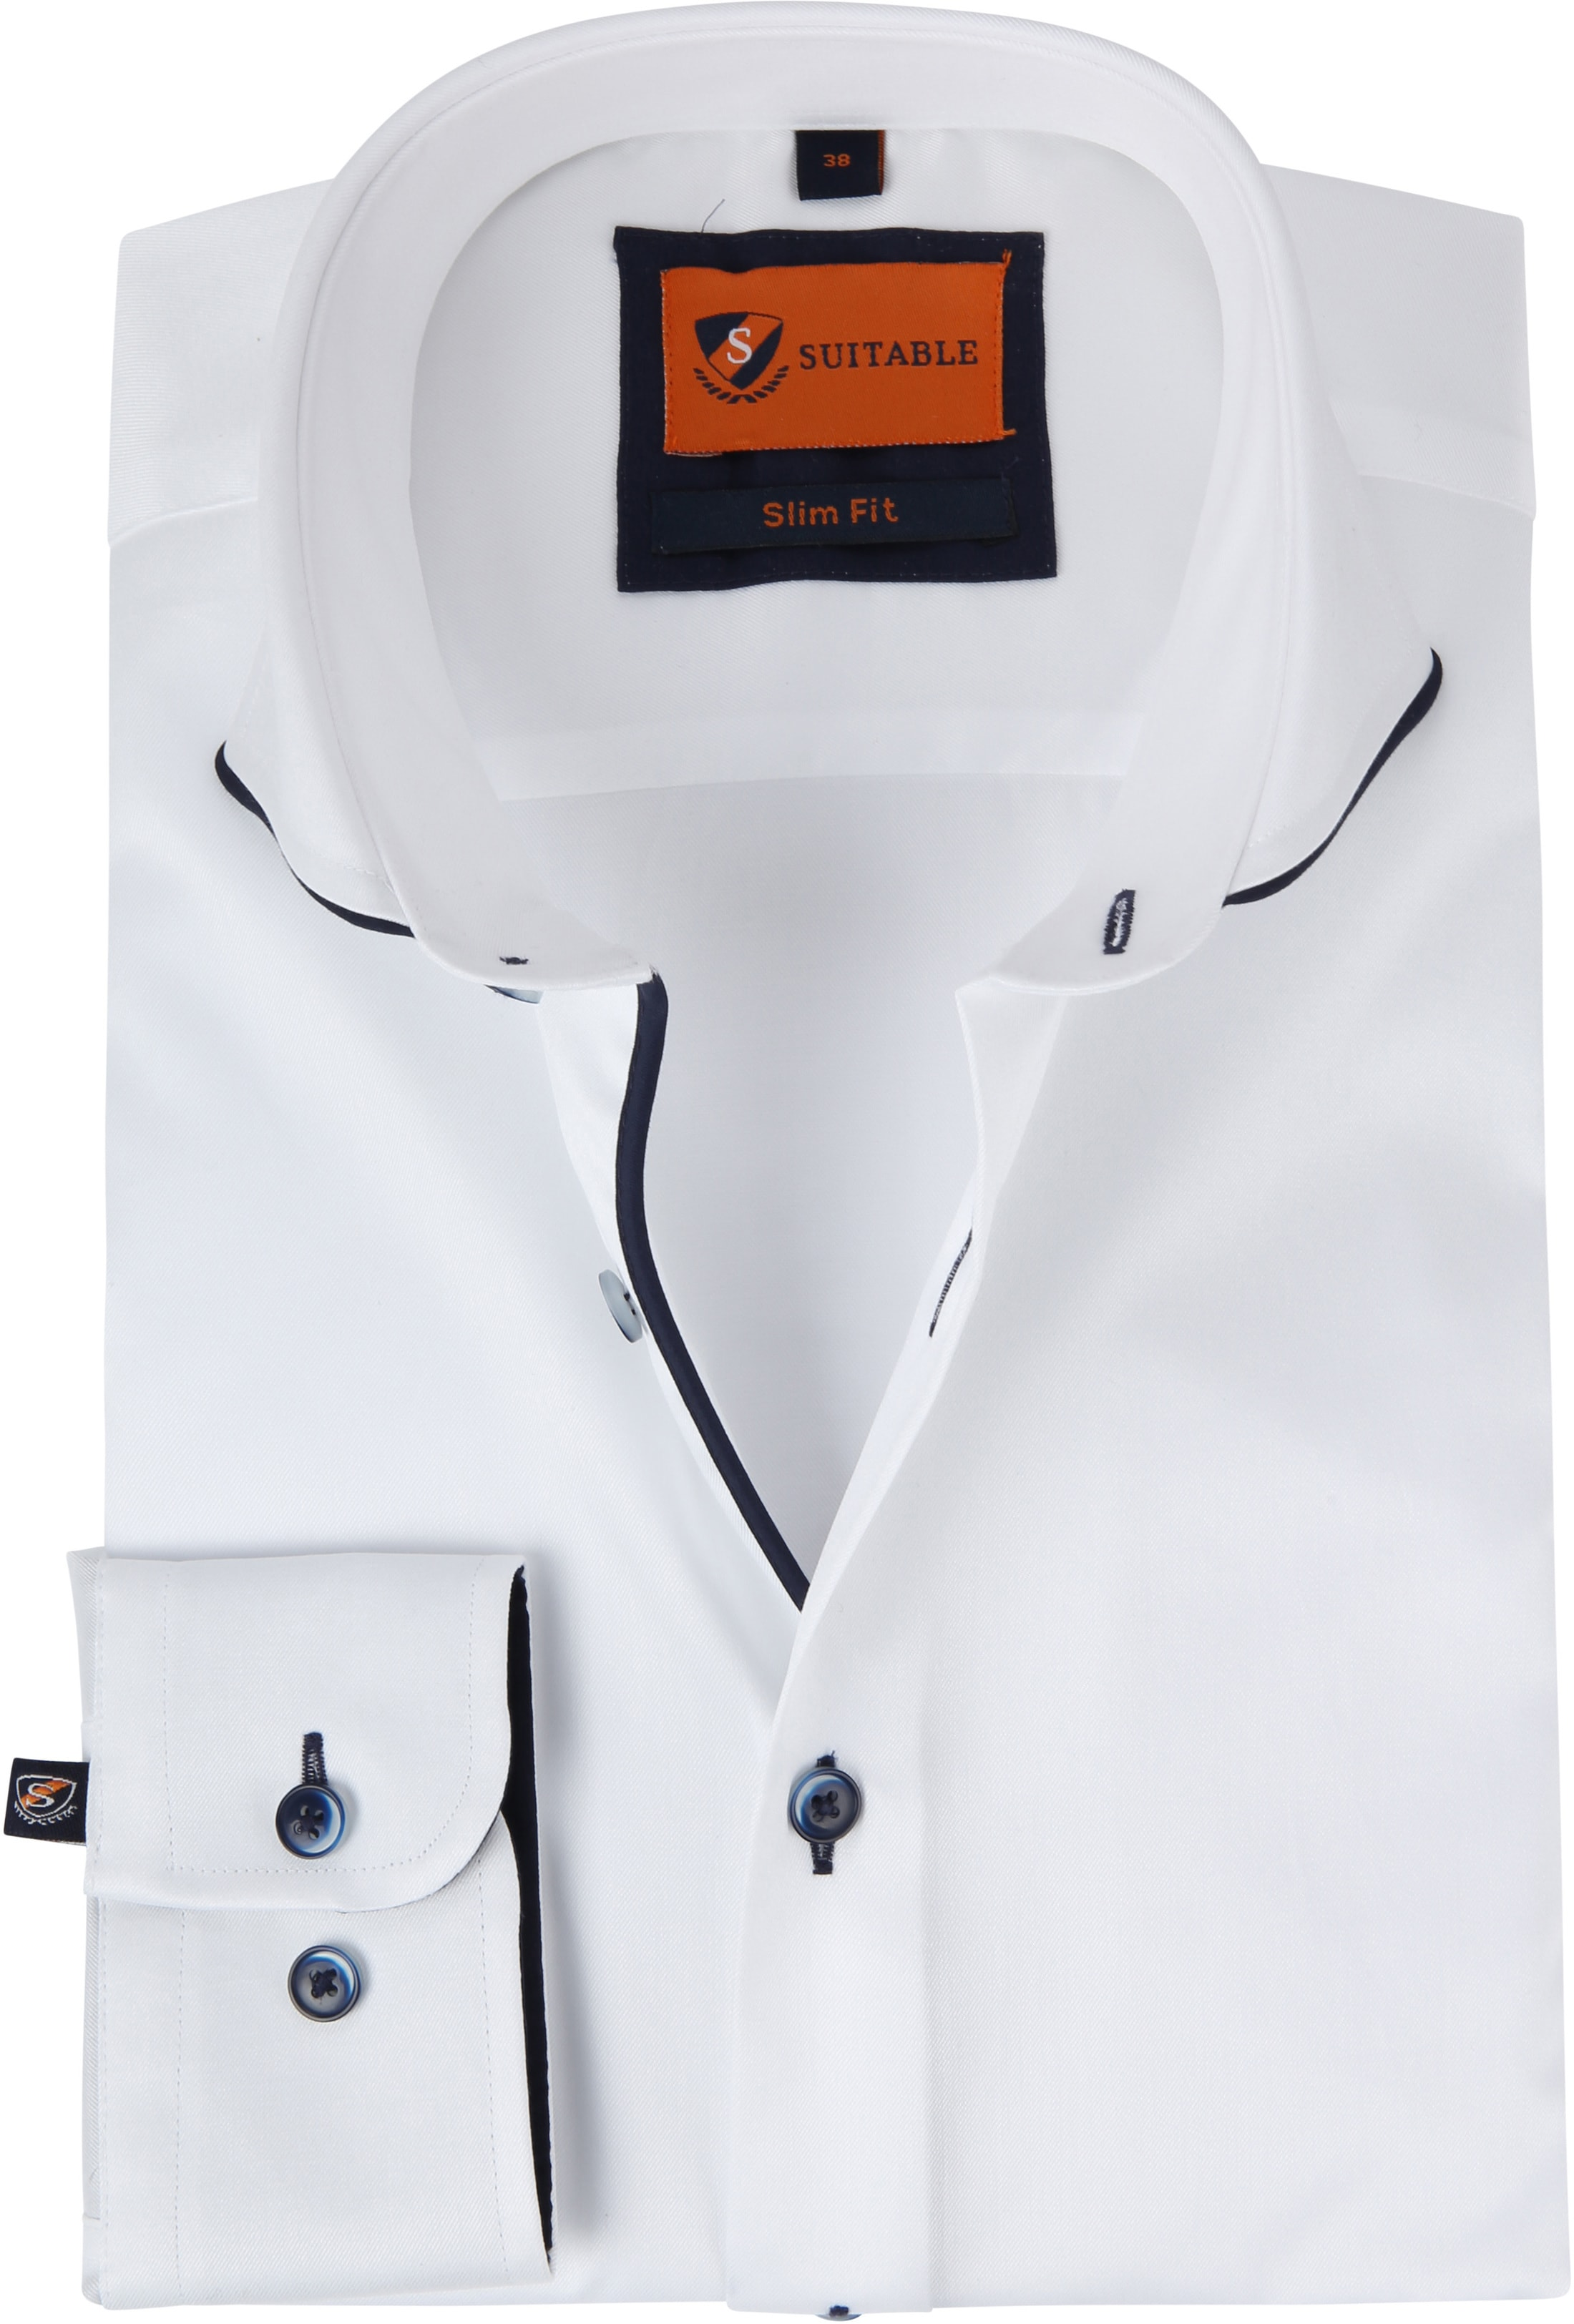 Suitable Overhemd Smart Wit foto 0